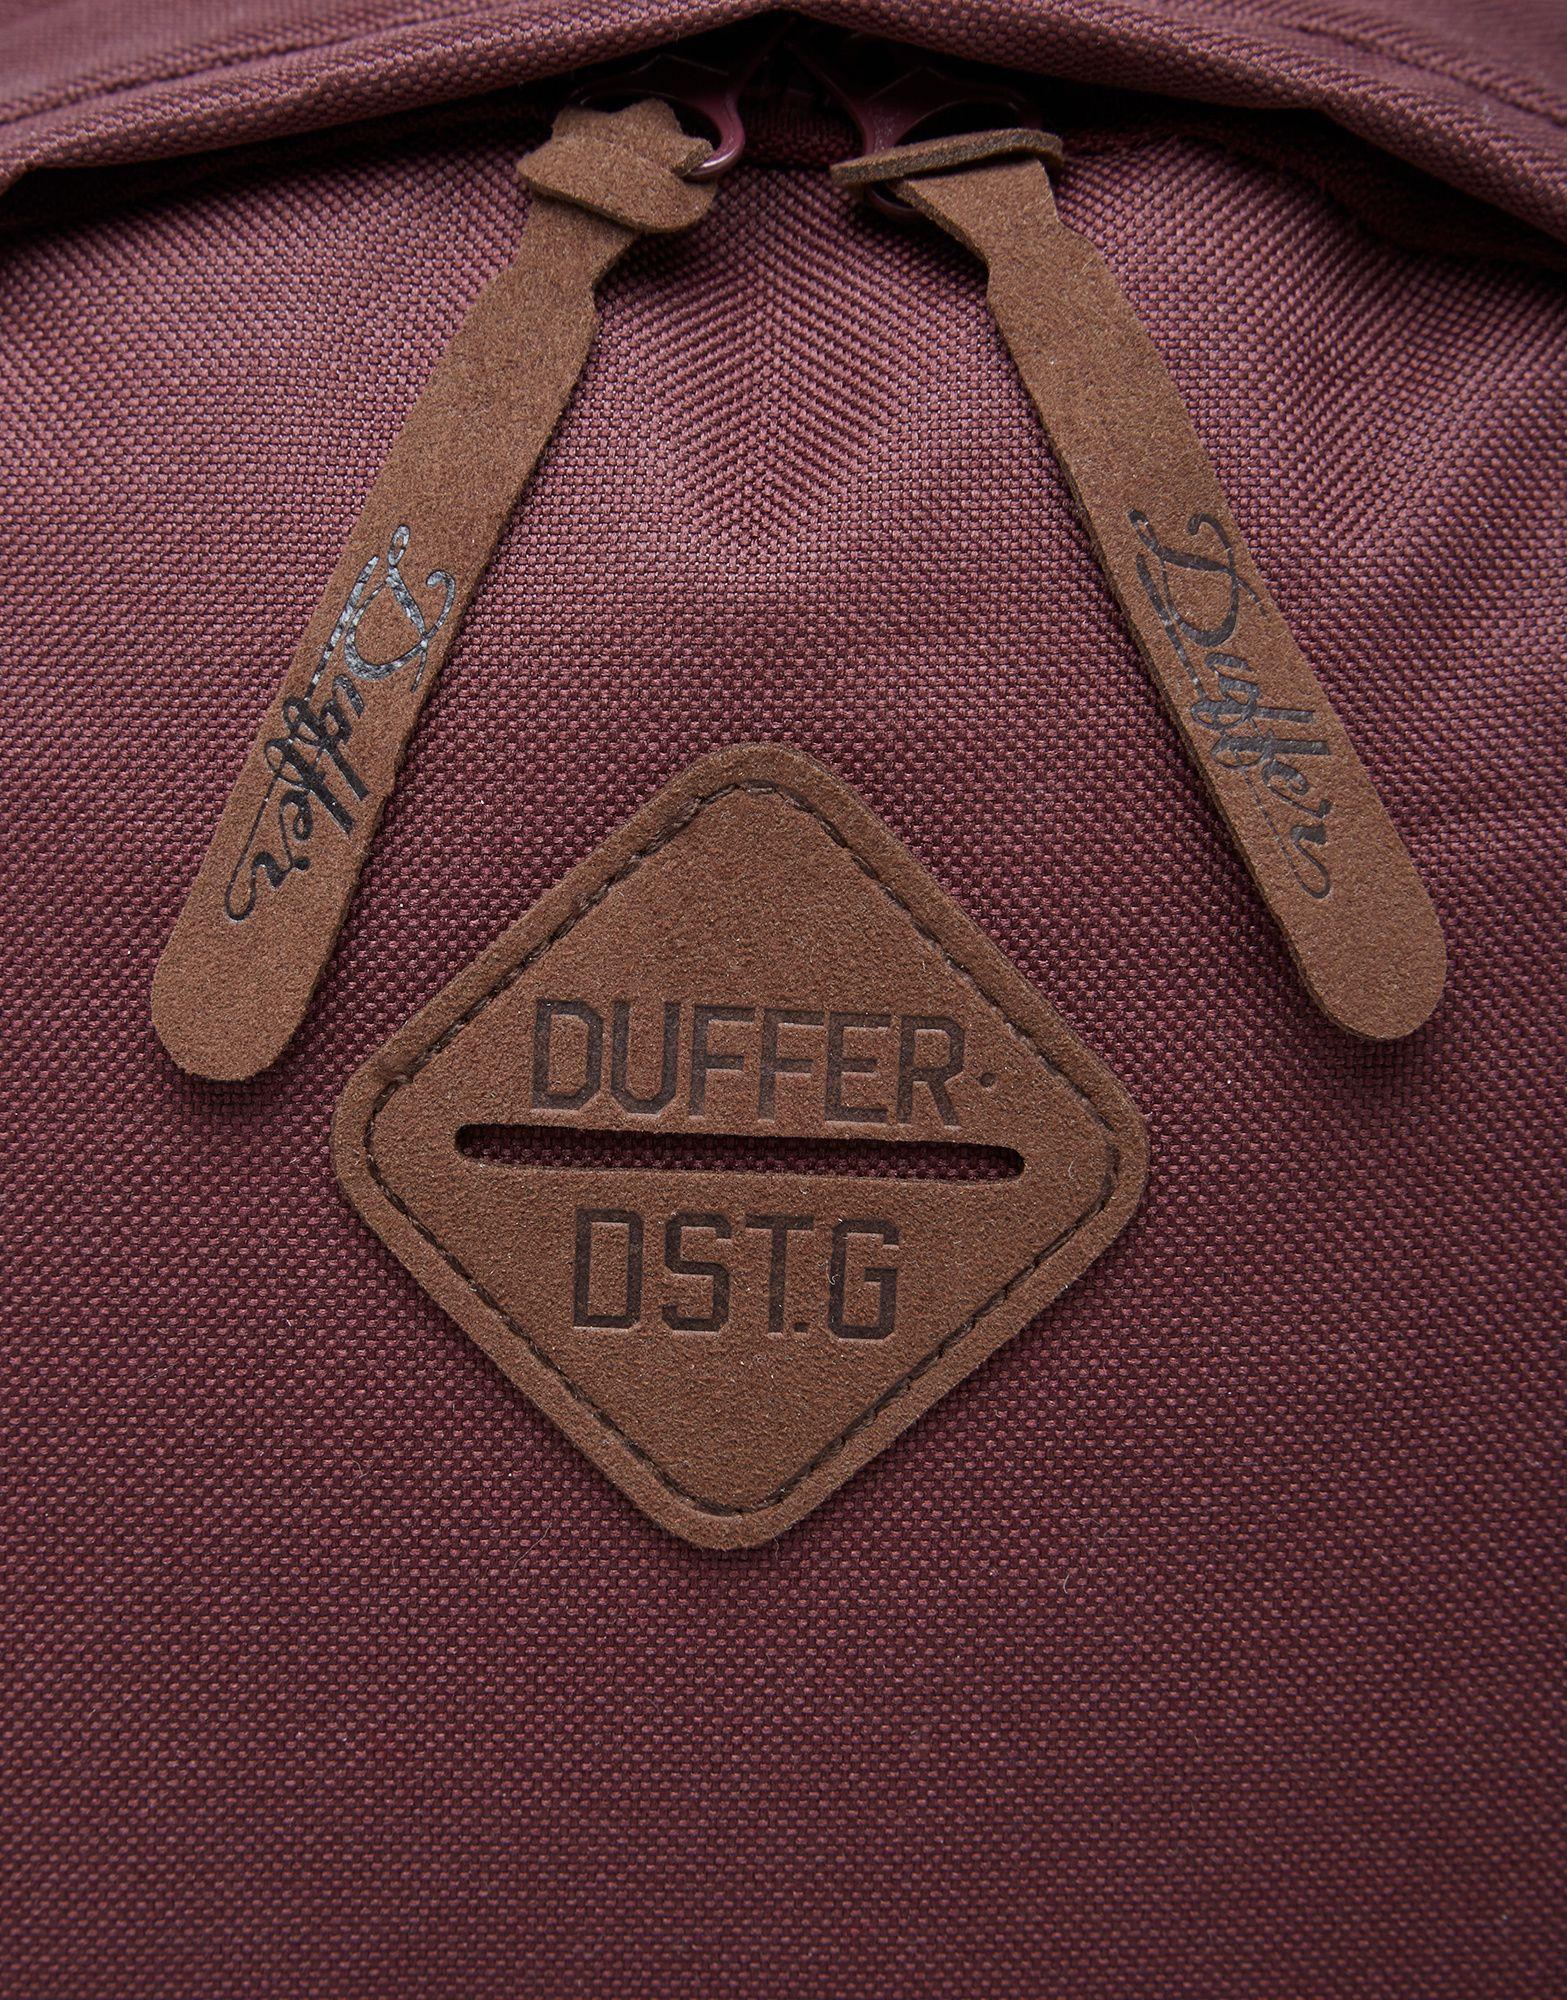 Duffer of St George Pinewood Backpack